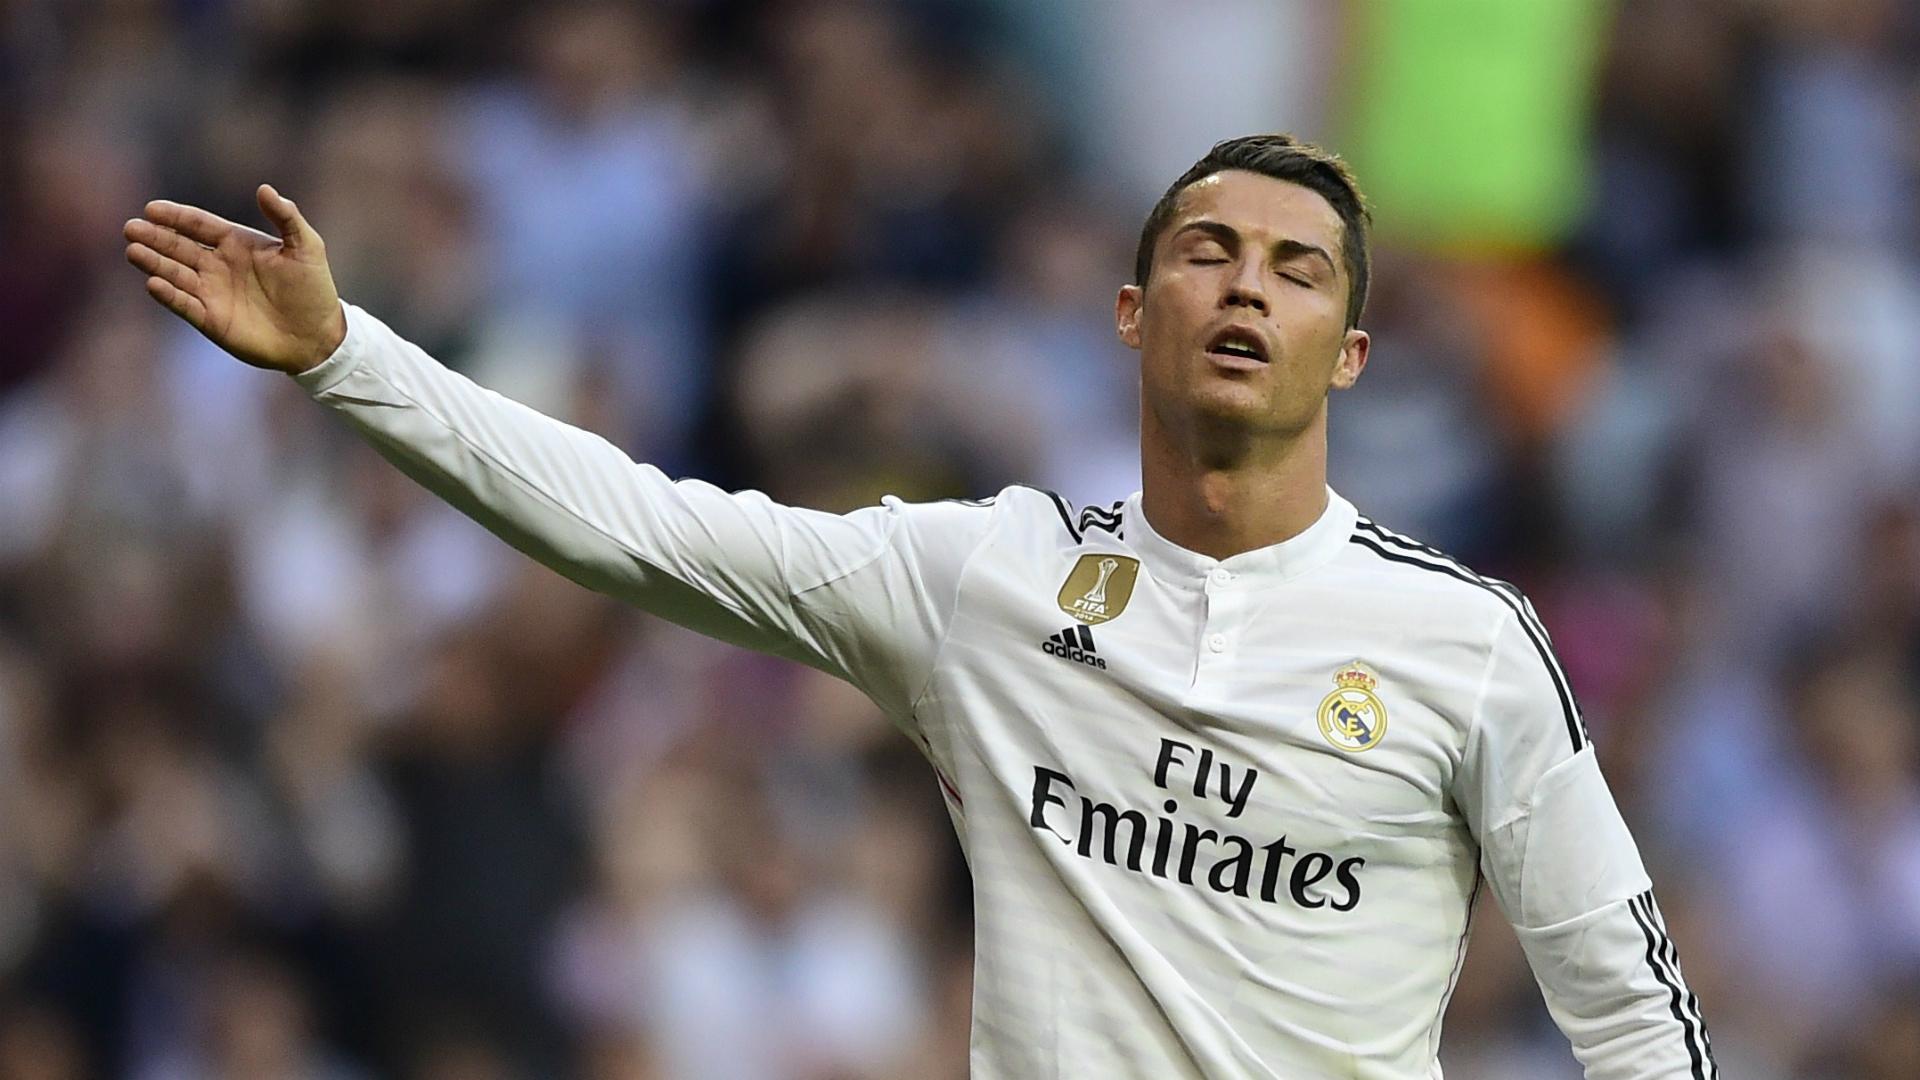 Ronaldo hasn't beaten a defender for months – Sacchi